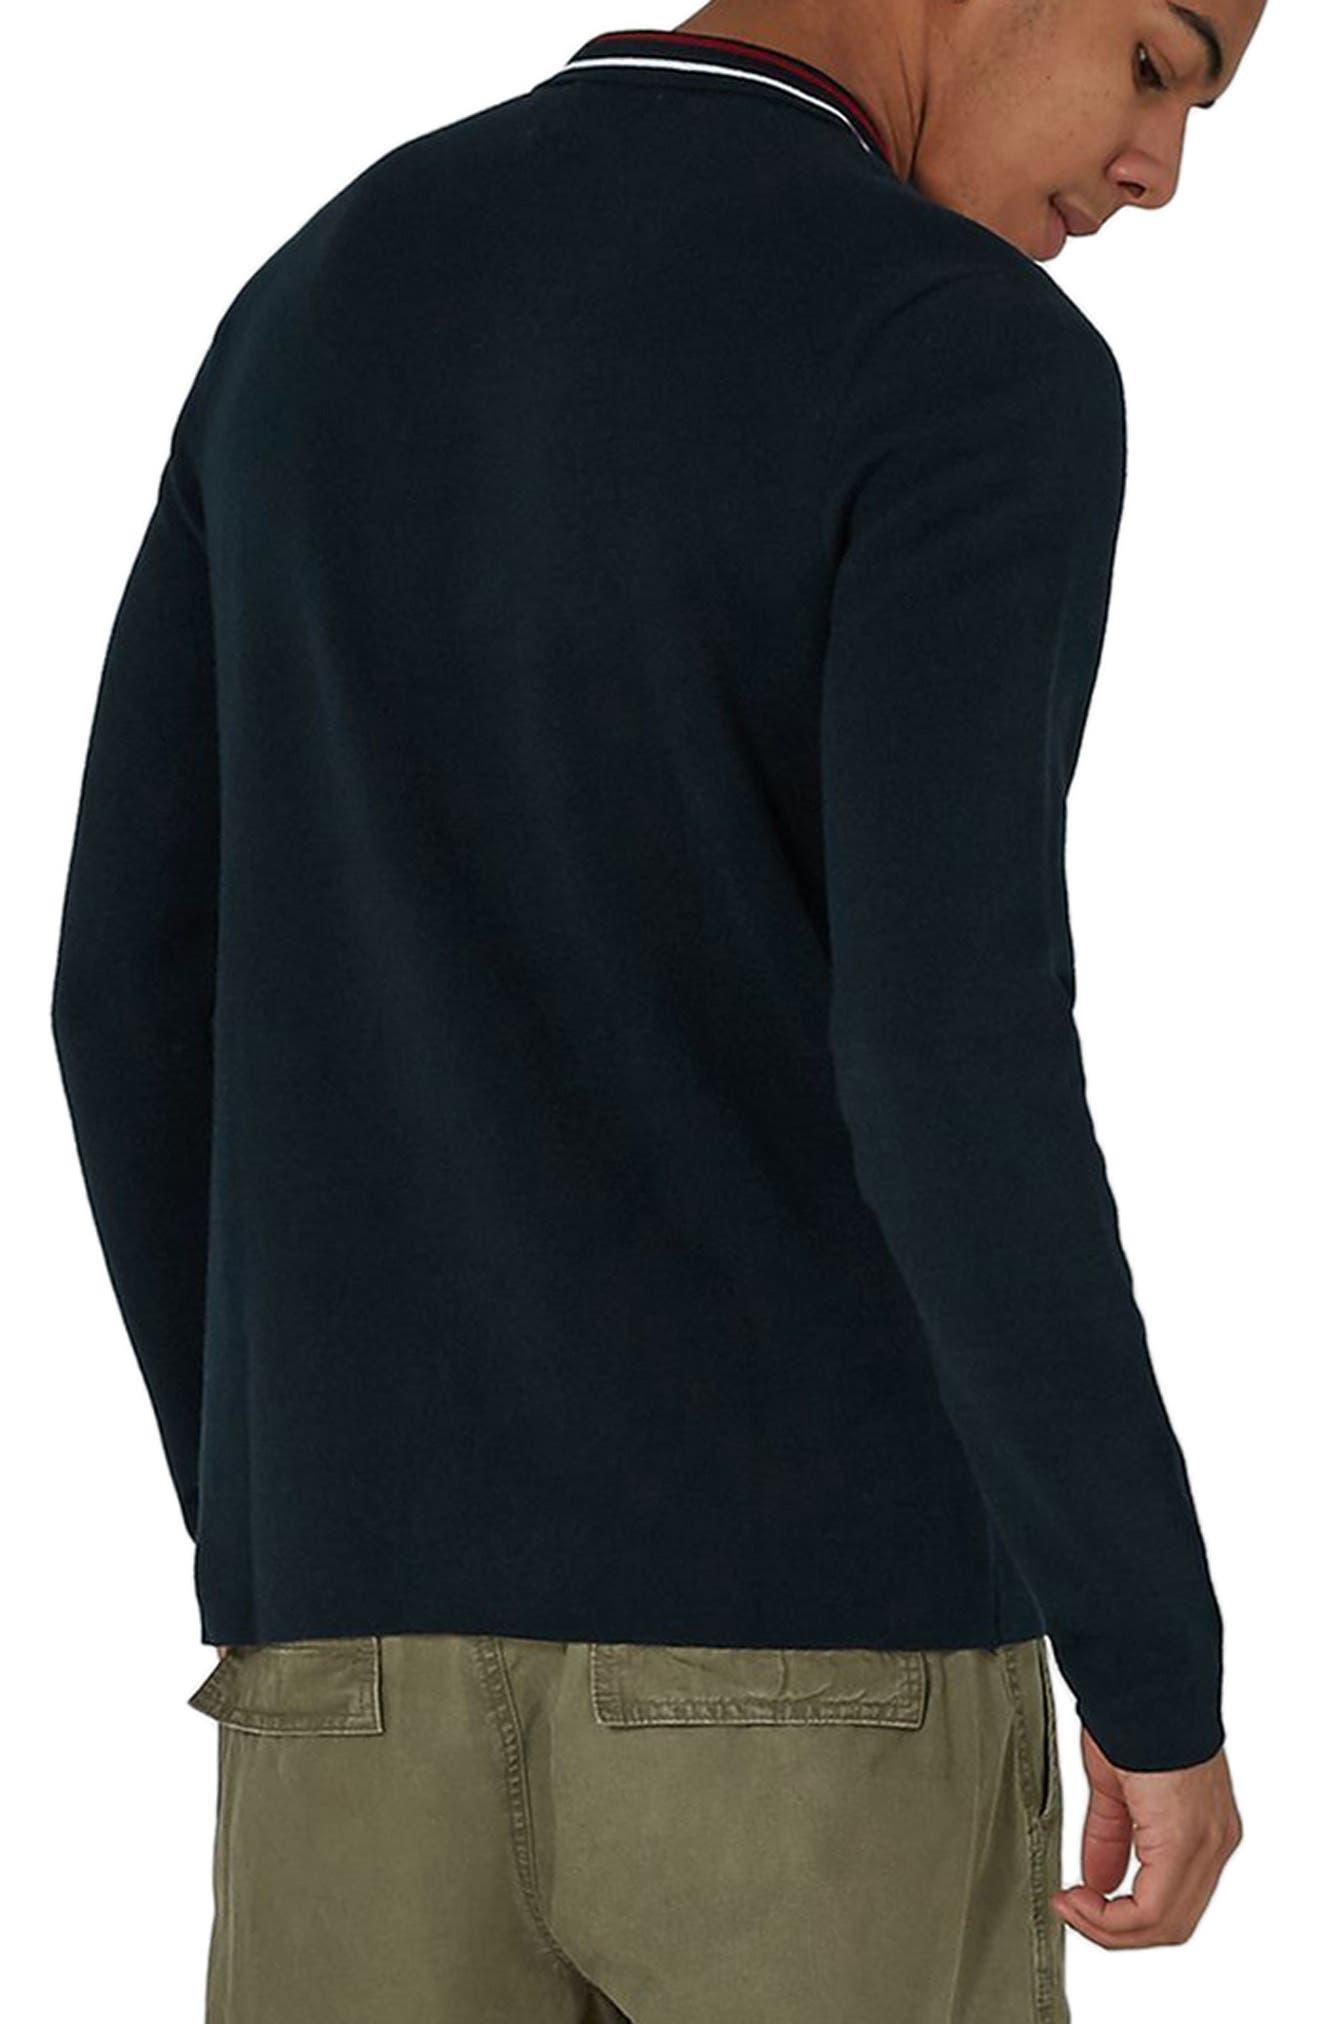 Stripe Knit Zip Front Harrington Sweatshirt,                             Alternate thumbnail 2, color,                             Navy Blue Multi